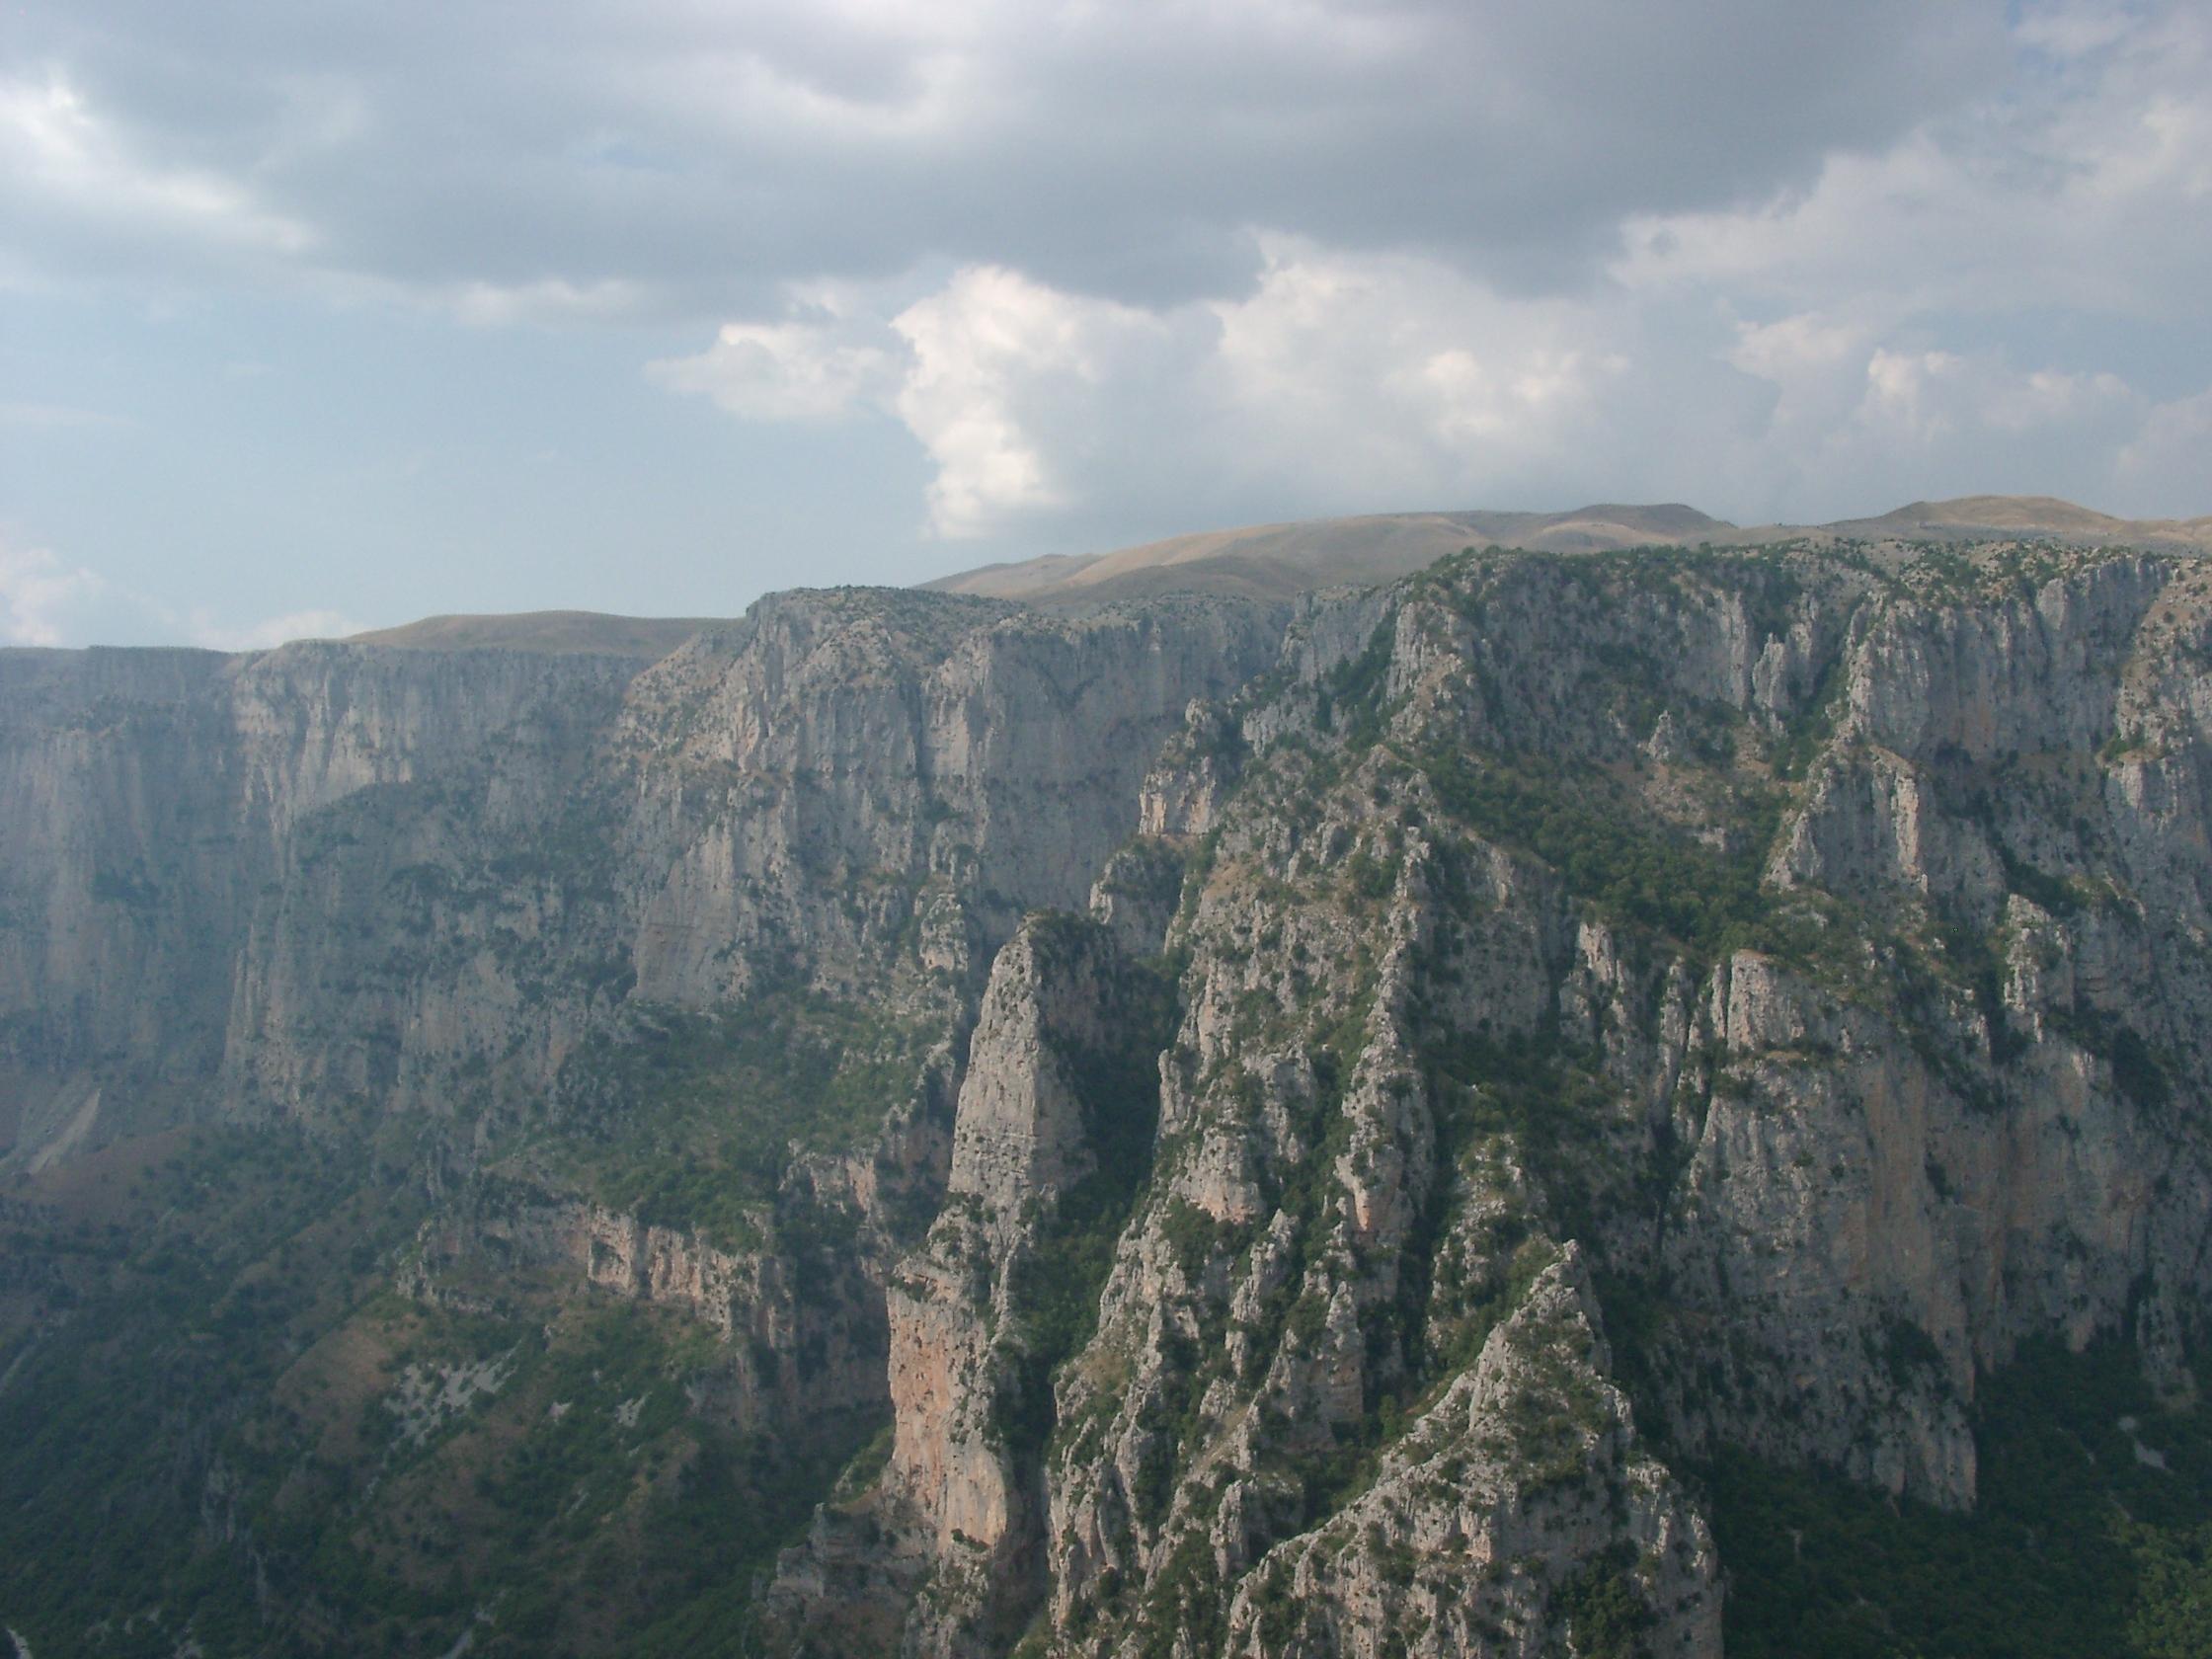 File:Vikos Gorge, Epirus, Greece 02.jpg - Wikimedia Commons